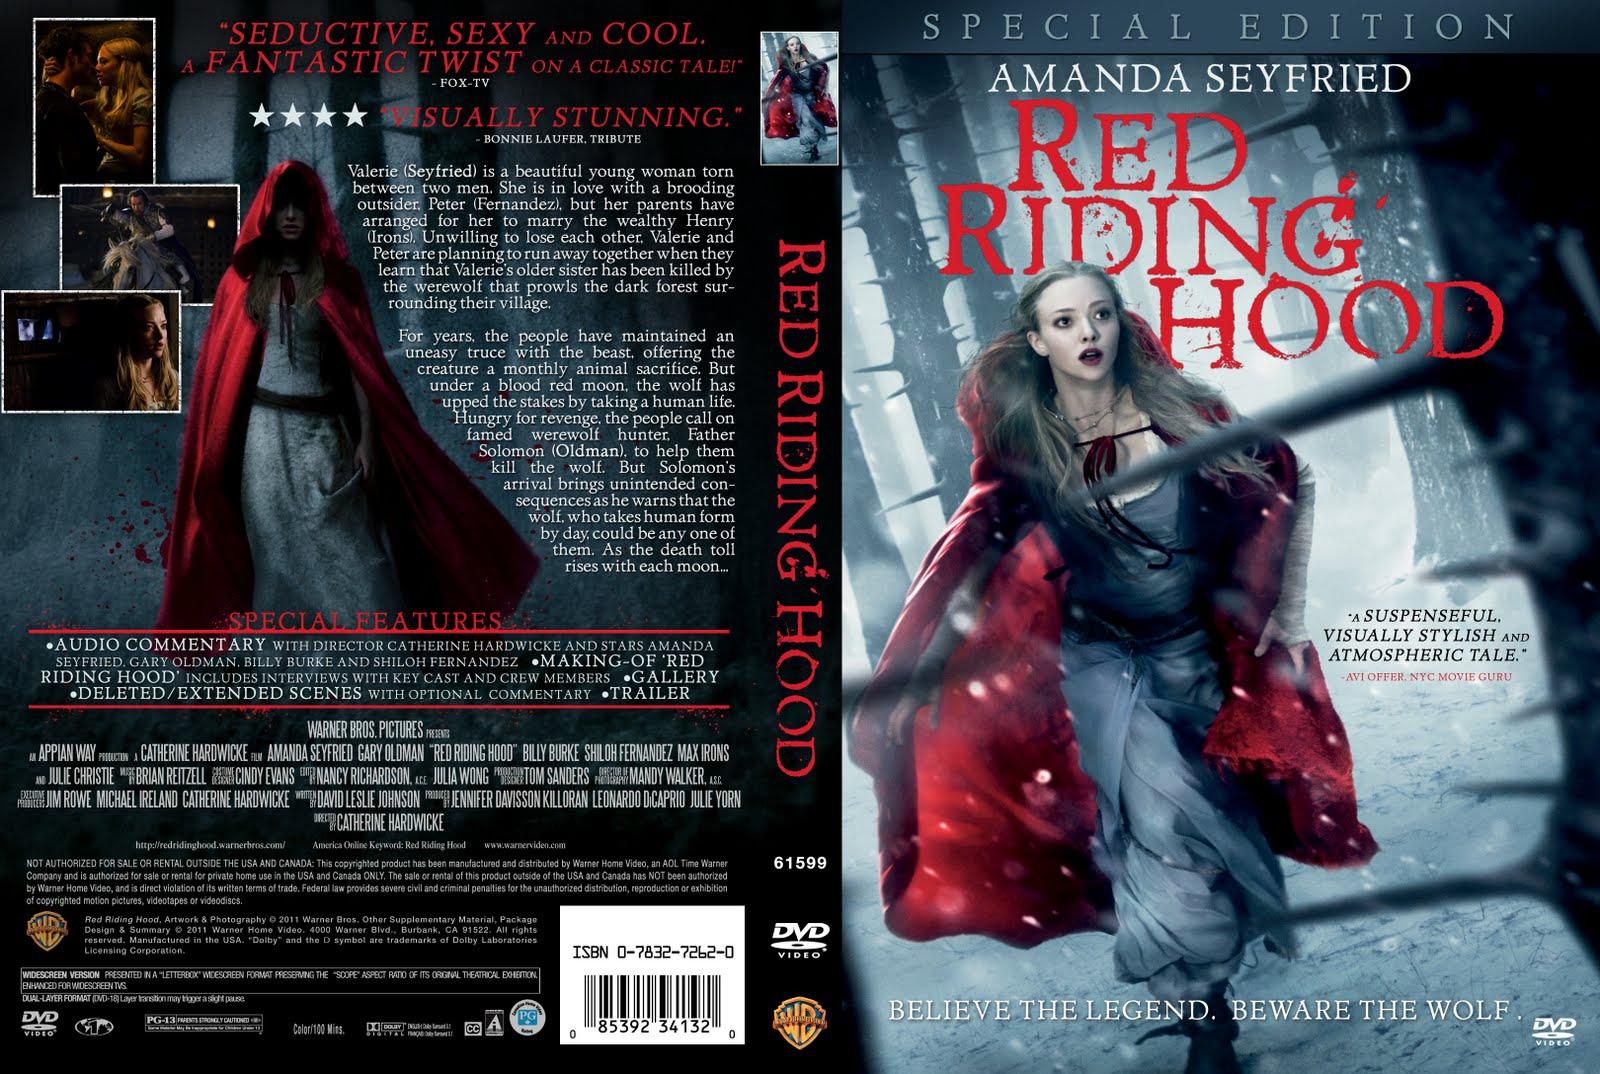 http://3.bp.blogspot.com/-Hwlj1SwgVP0/TZg7BKKsSTI/AAAAAAAAAJA/z1fCxRreOVY/s1600/Red_Riding_Hood_dvd_cover.jpg